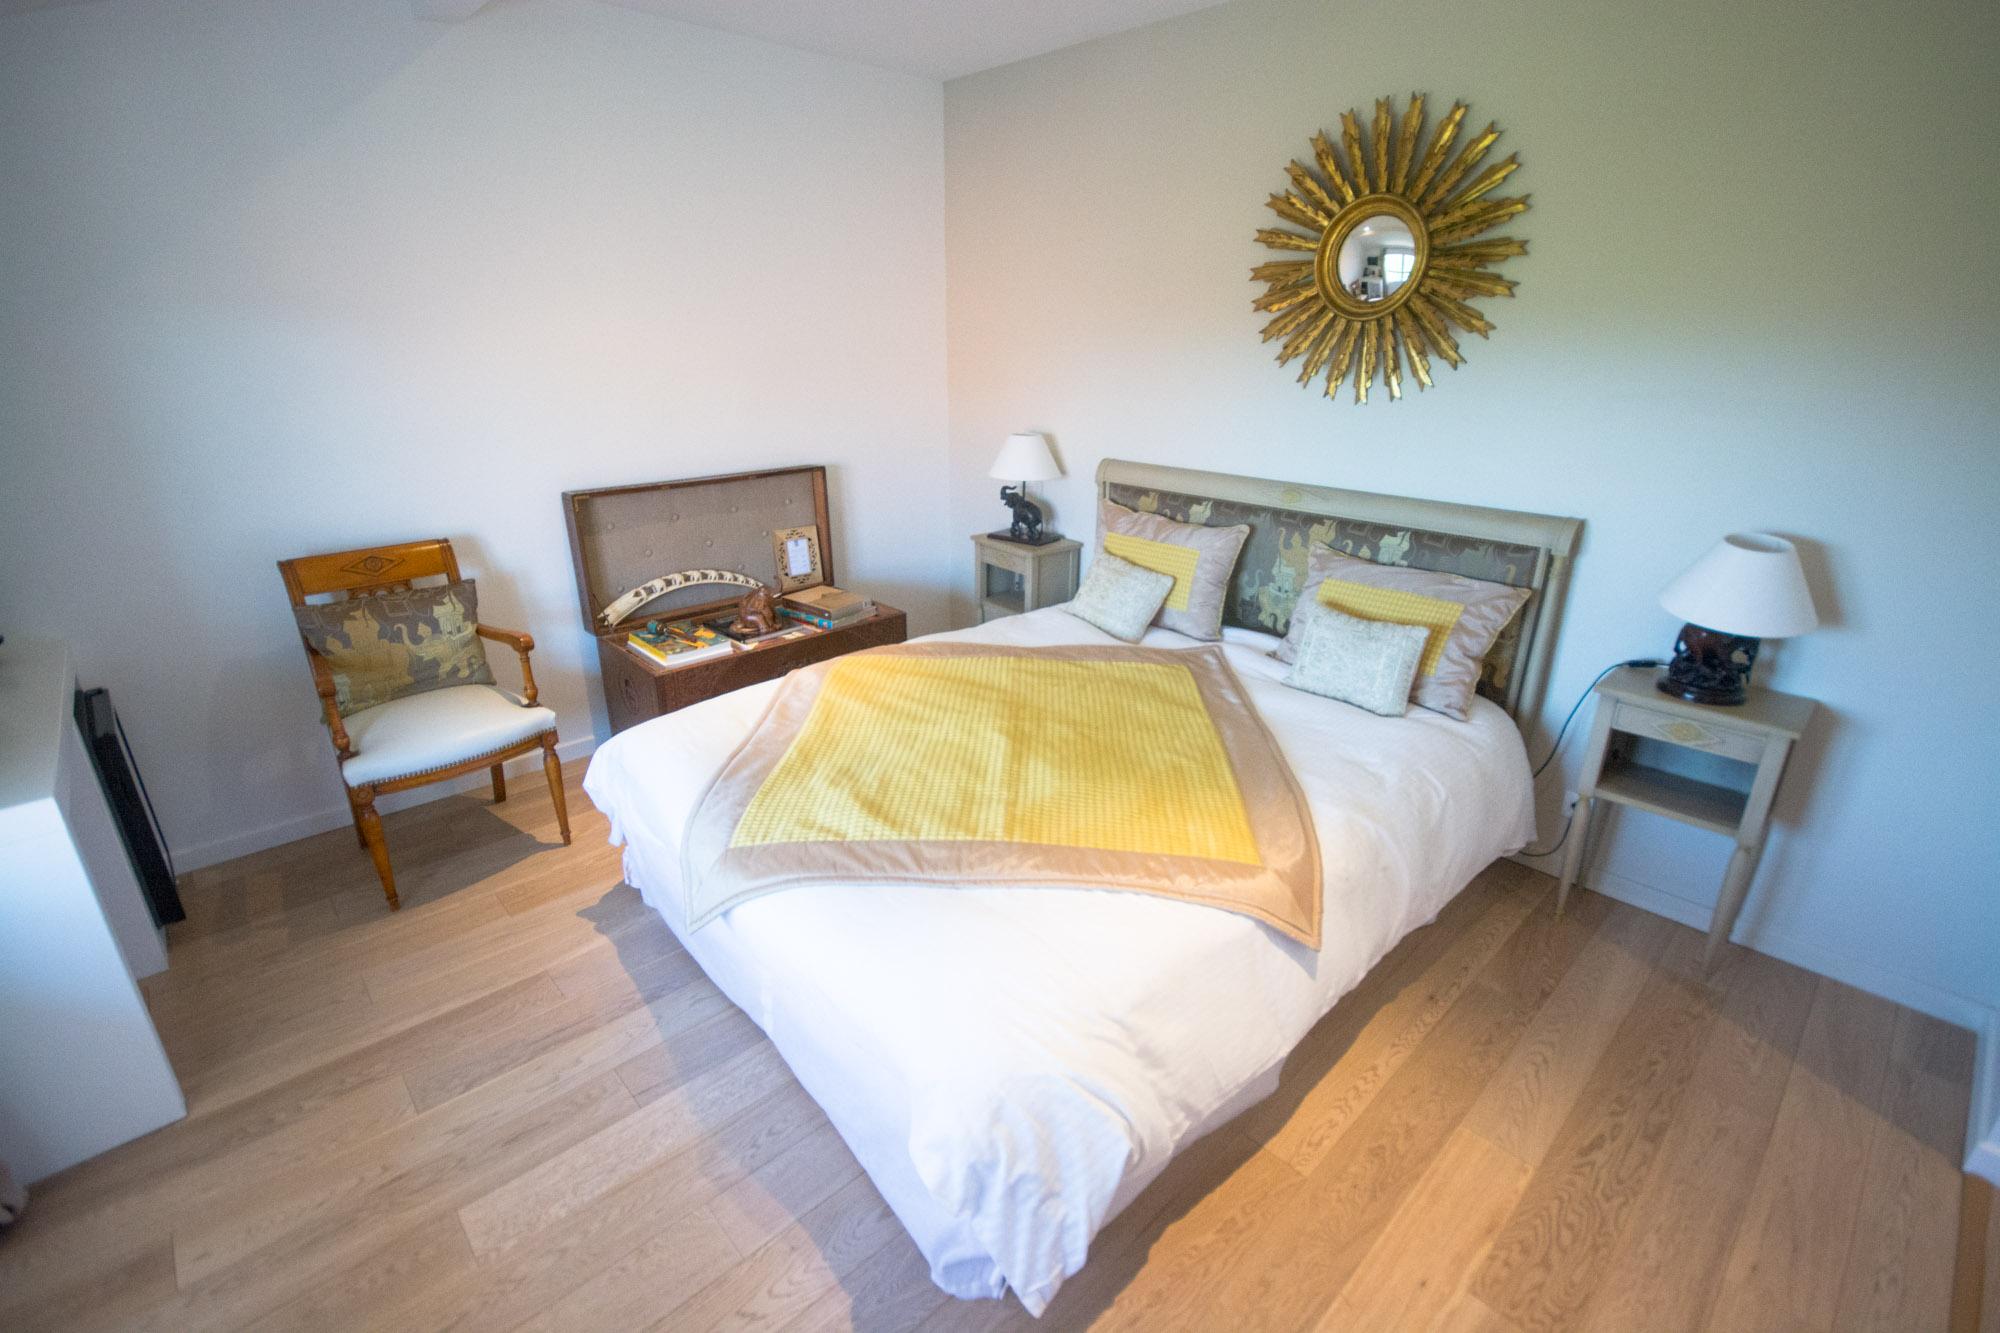 Ainhoa chambre dhotes bidart biarritz bistaeder